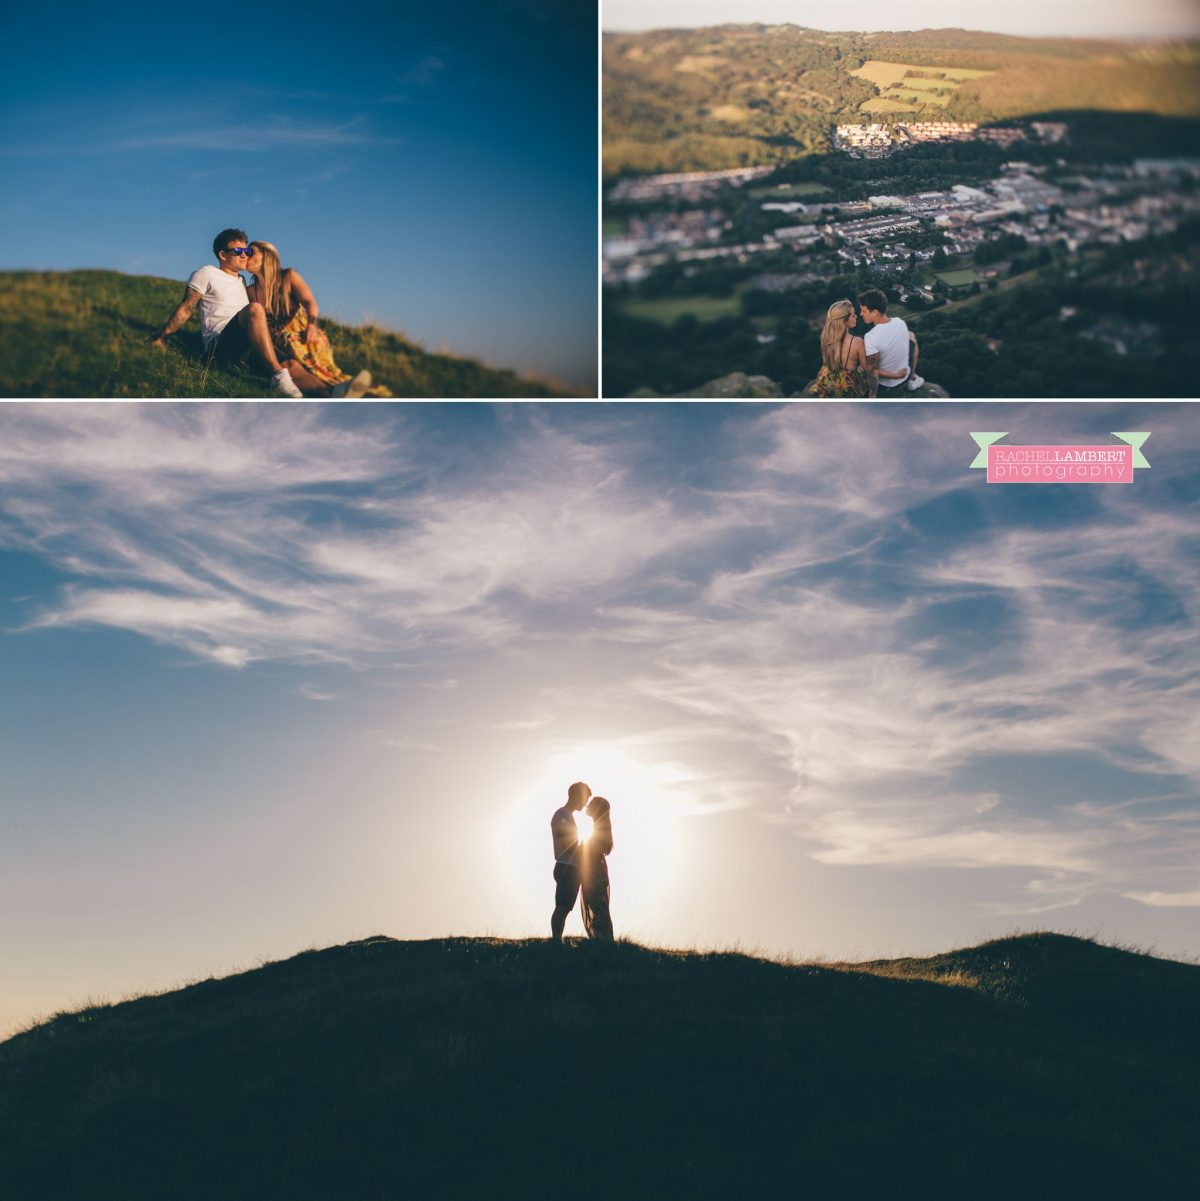 welsh_wedding_photographer_decourceys_rachel_lambert_photography_ceri_chris_engagement_shoot_garth_mountain_ 10